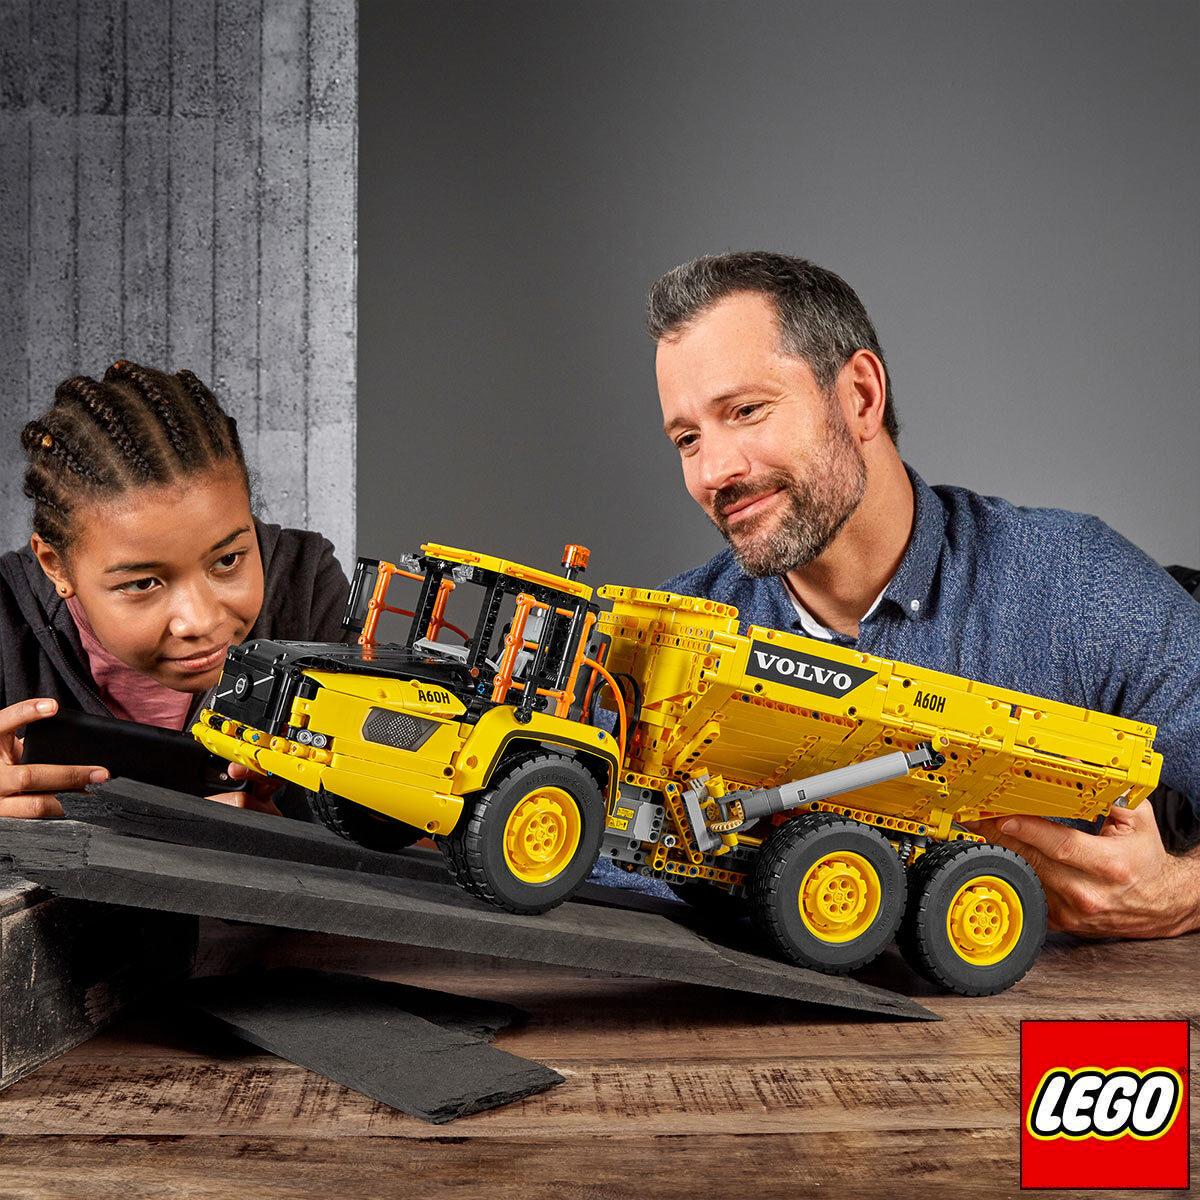 LEGO Technic 6X6 Control+ Volvo Articulated Hauler - Model 42114 - £159.99 delivered at Costco